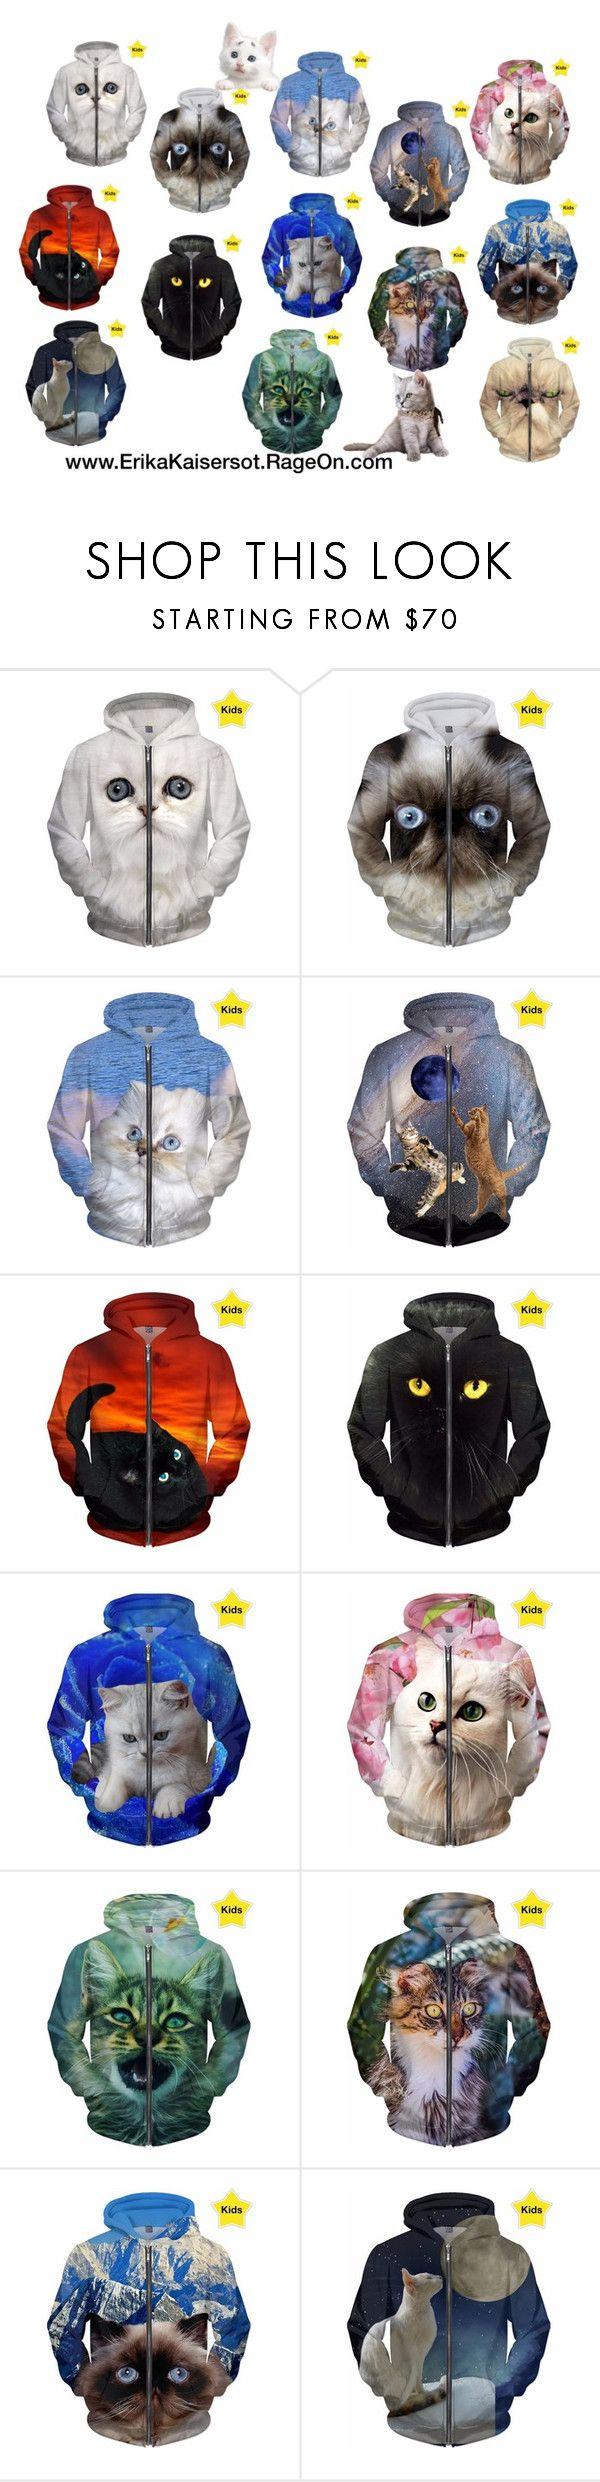 NEW hoodies for kids with cats. #hoodie #cat by #ErikaKaisersot on @RageOn ErikaKaisersot.RageOn.com